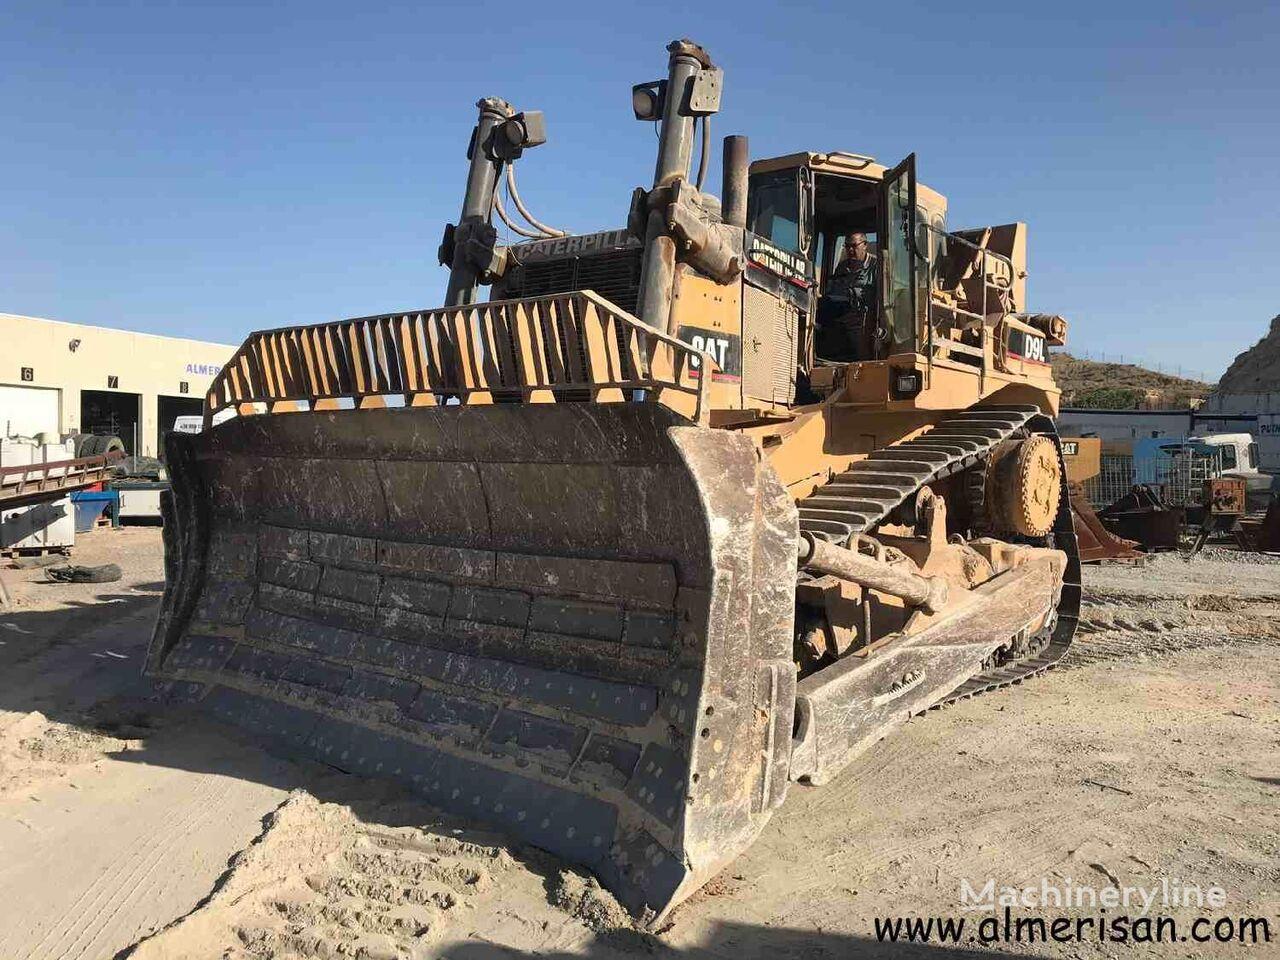 CATERPILLAR D9L. BULLDOZER bulldozer